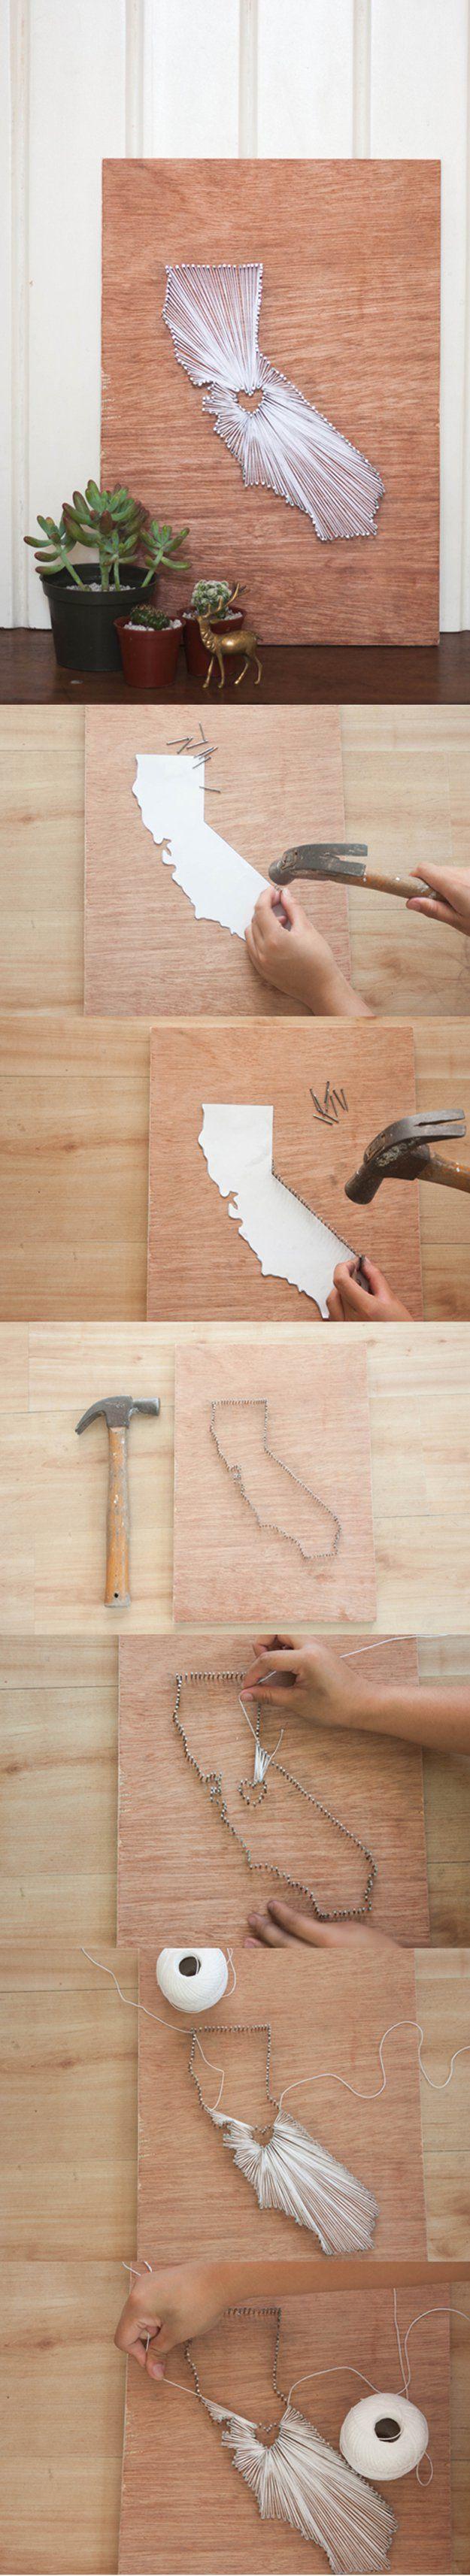 25 best adult crafts ideas on pinterest bathroom crafts art diy home decor crafts you can make in under an hour diyready com easy